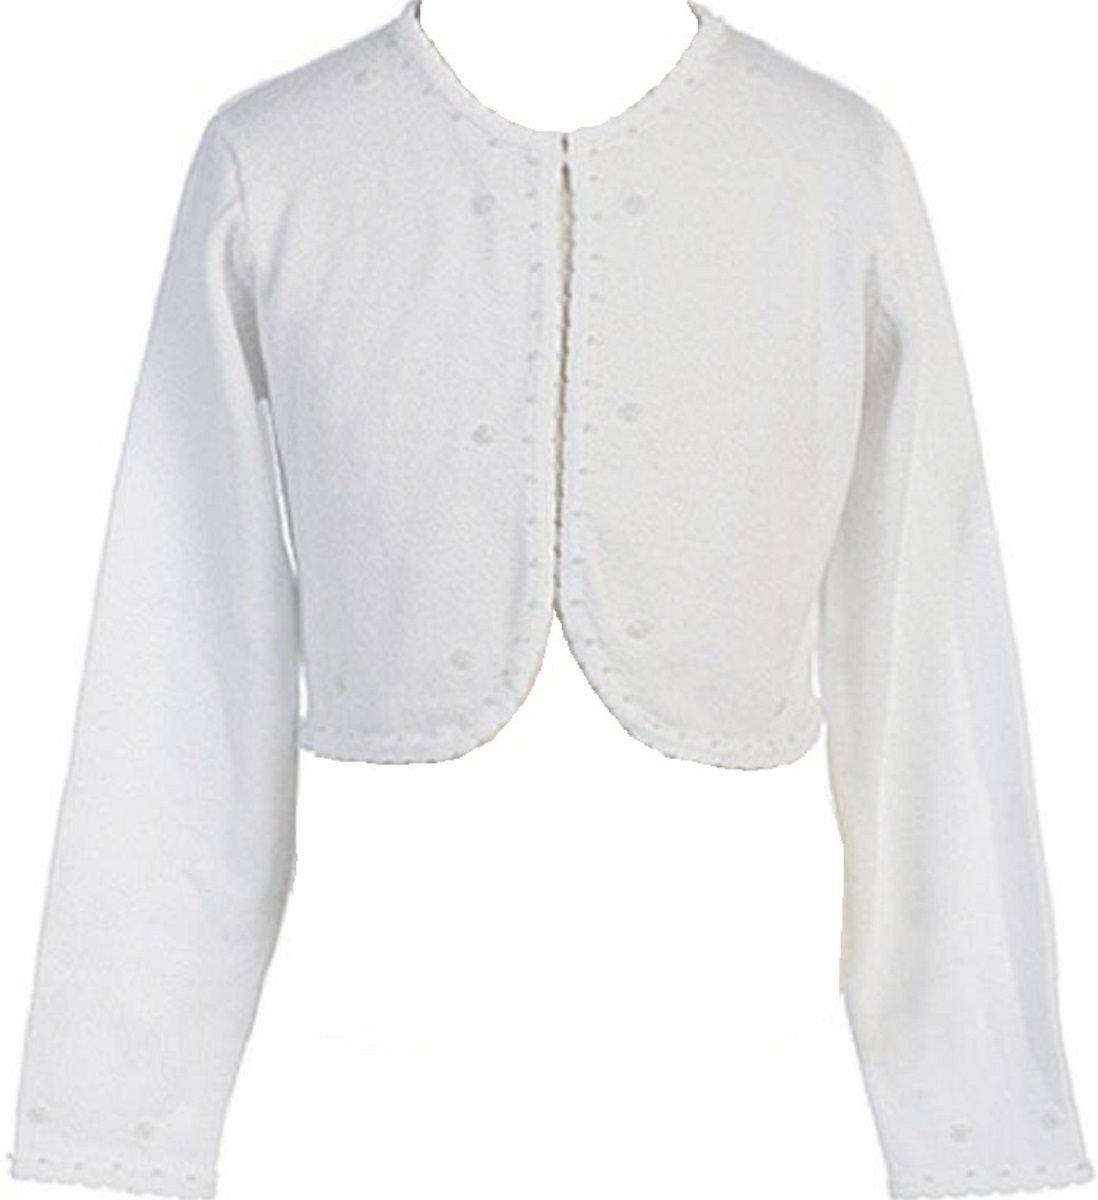 Little Girls Beaded Knit Cotton Bolero Shrug Sweater White Size S (2-4)